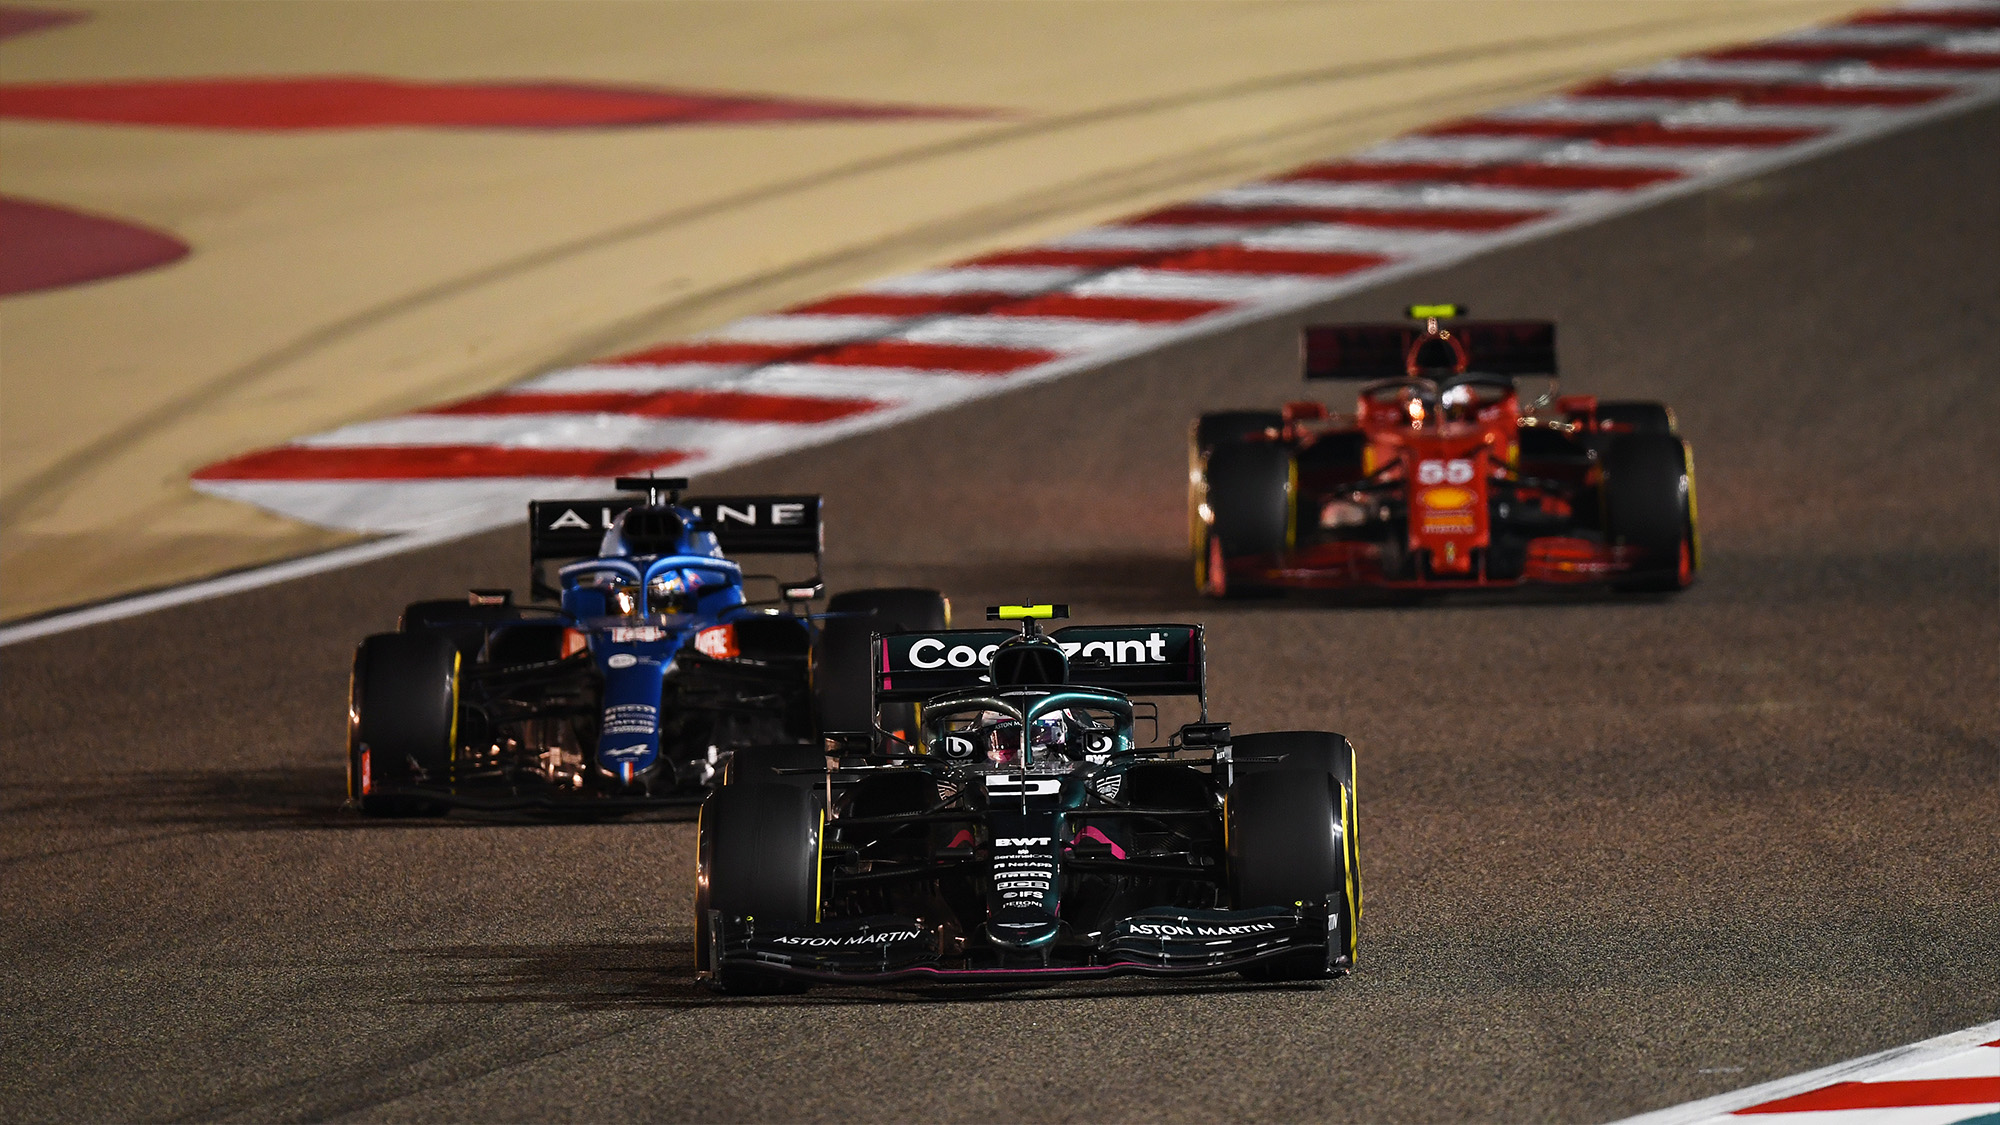 Sebastian Vettel Fernando Alonso and Carlos Sainz in the 2021 Bahrain Grand Prix